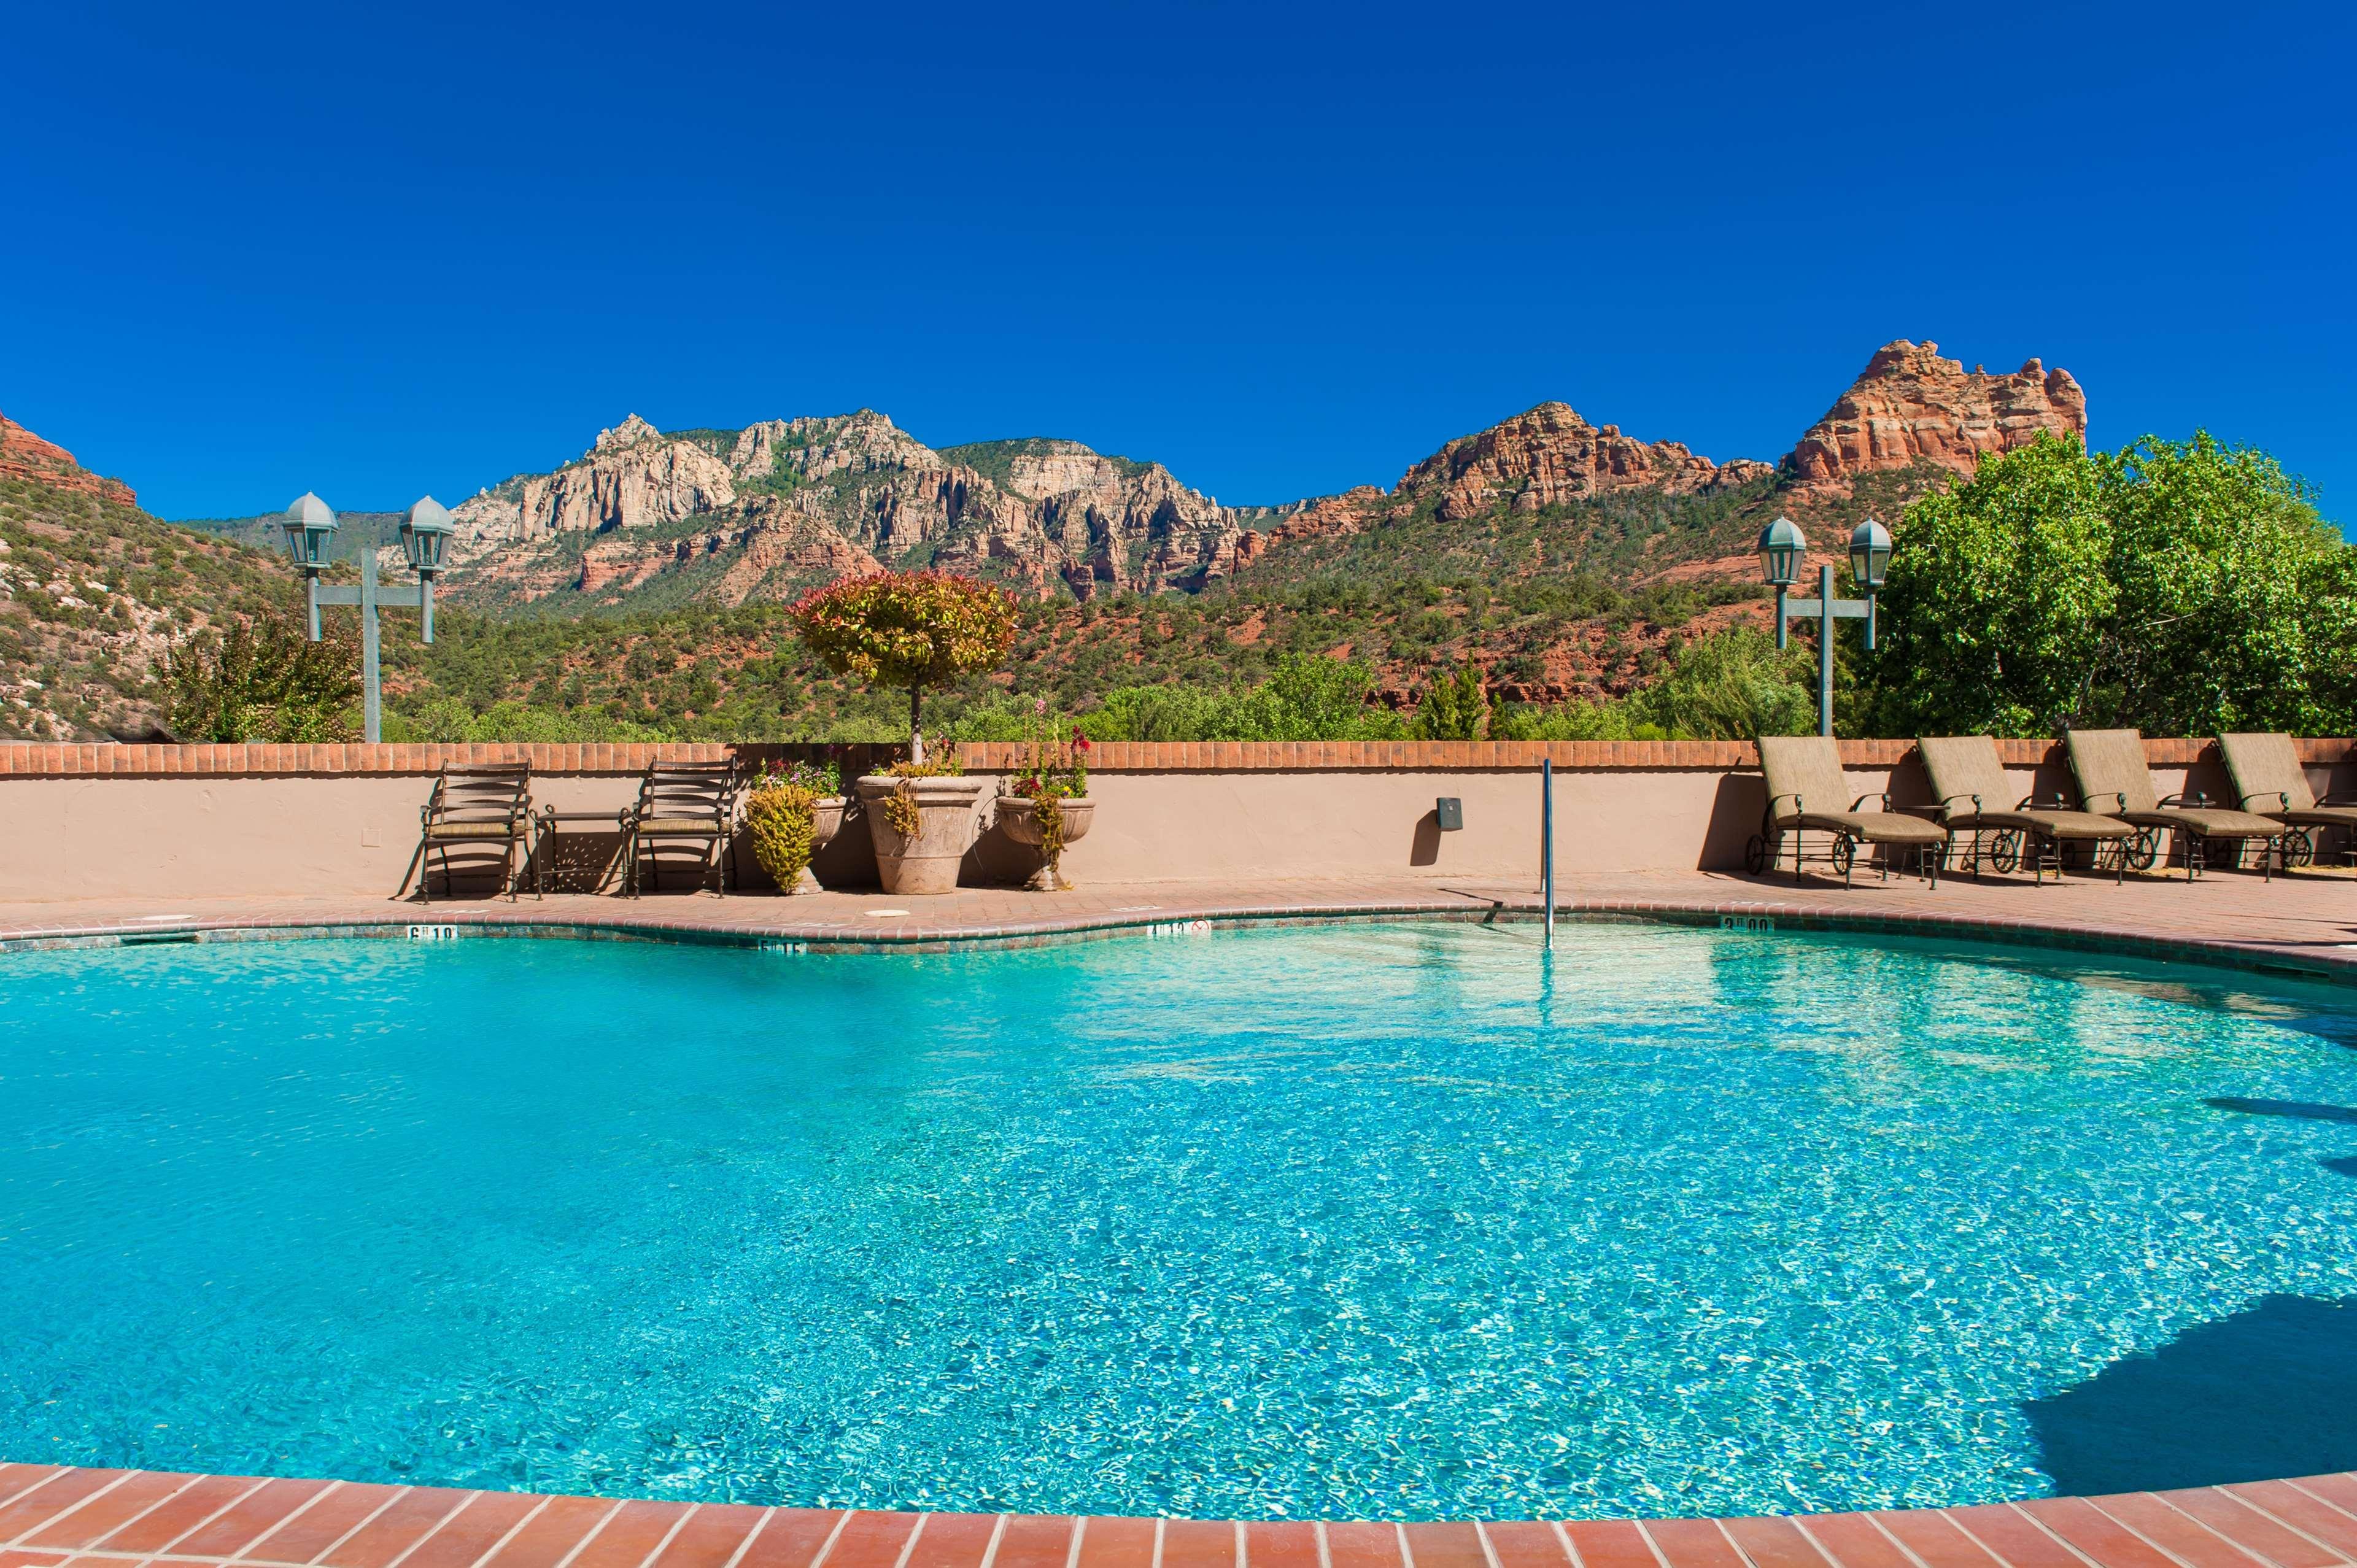 Best Western Plus Arroyo Roble Hotel & Creekside Villas image 2